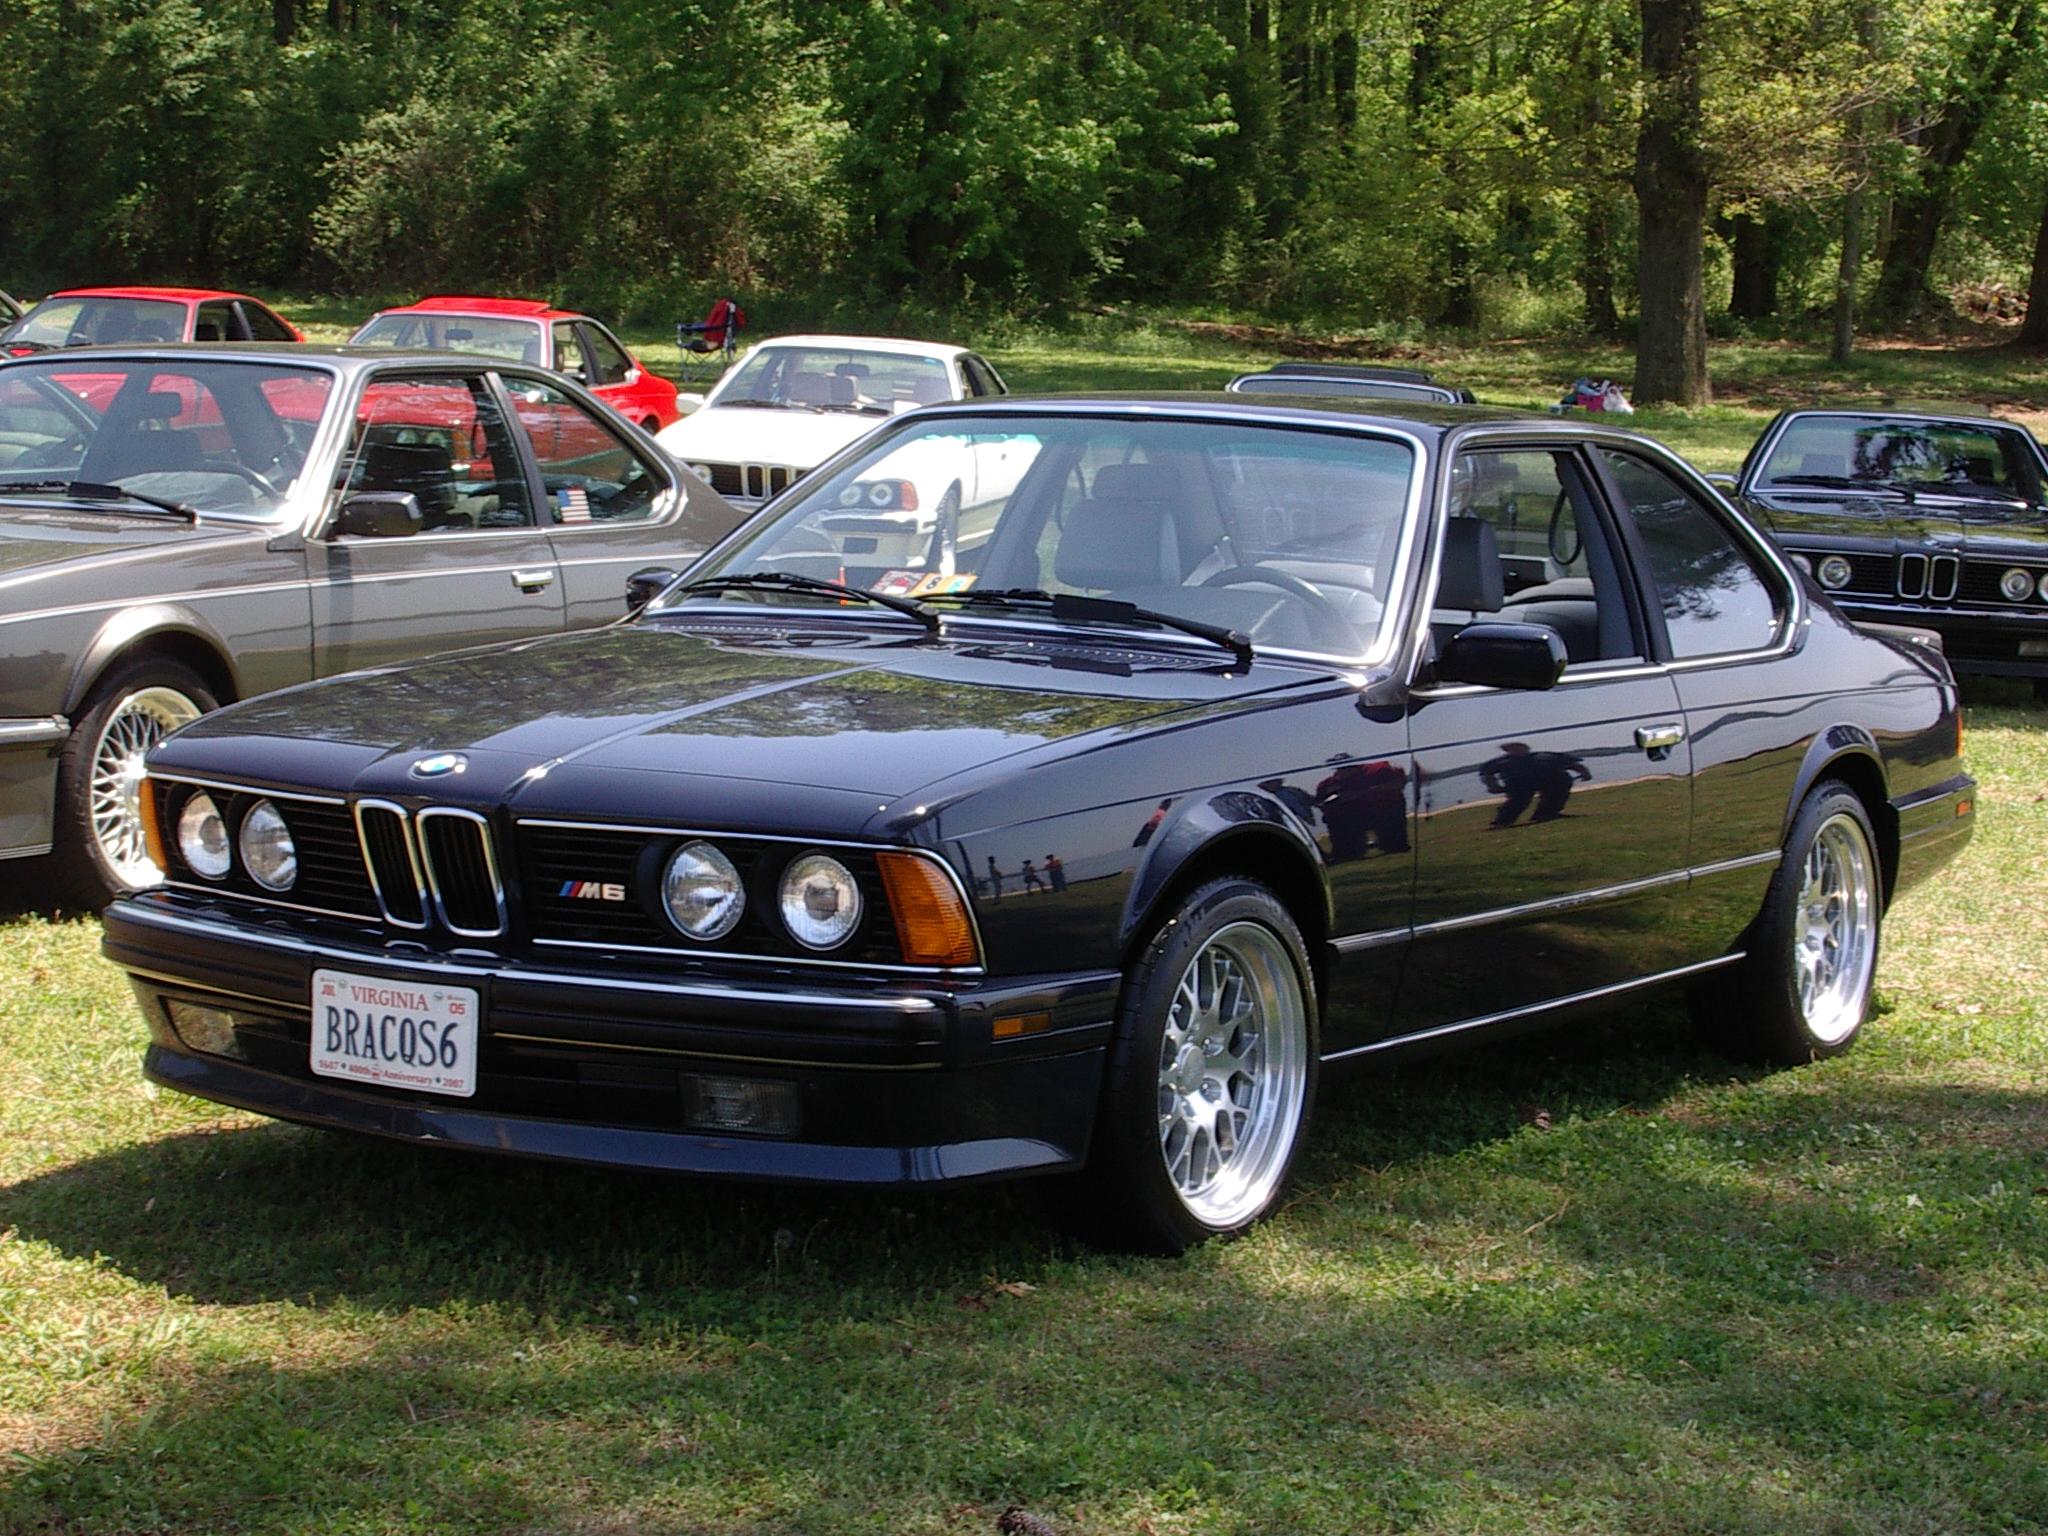 Perfect 1984 Bmw M5 Elaboration - Brand Cars Images - 17 ...